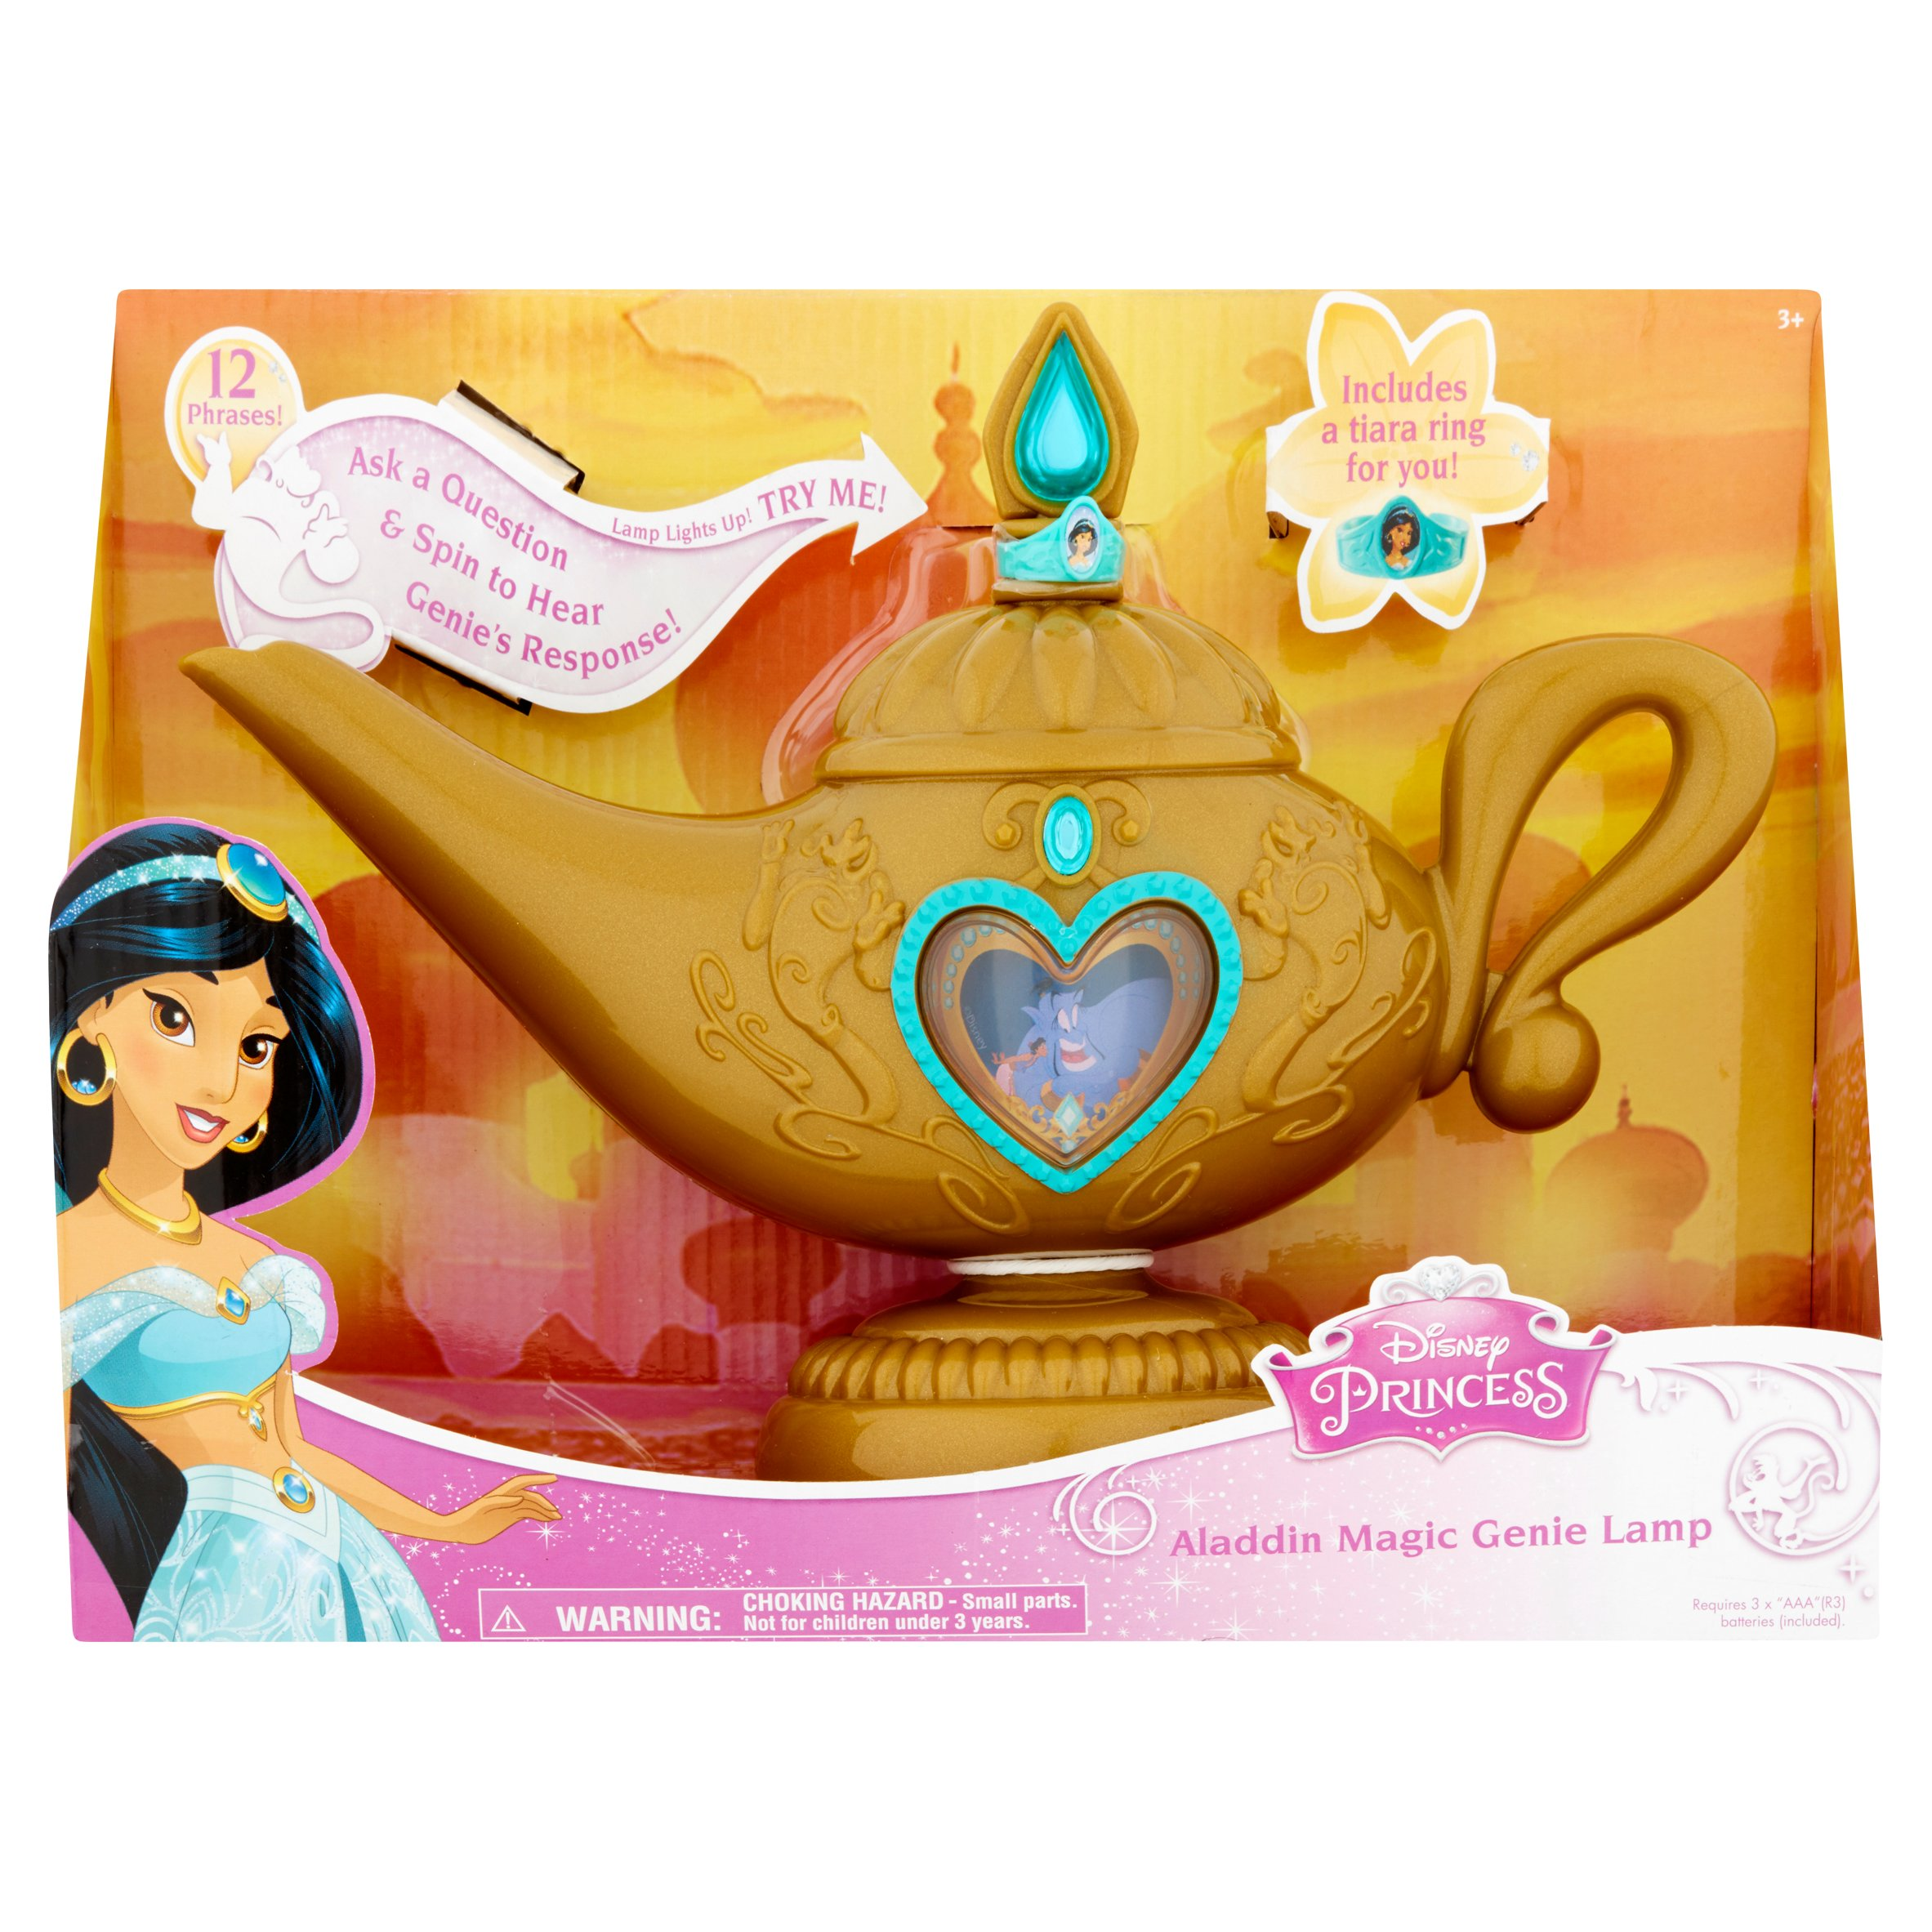 Disney Princess Aladdin Magic Genie Lamp 3+ by Jakks Pacific, Inc.